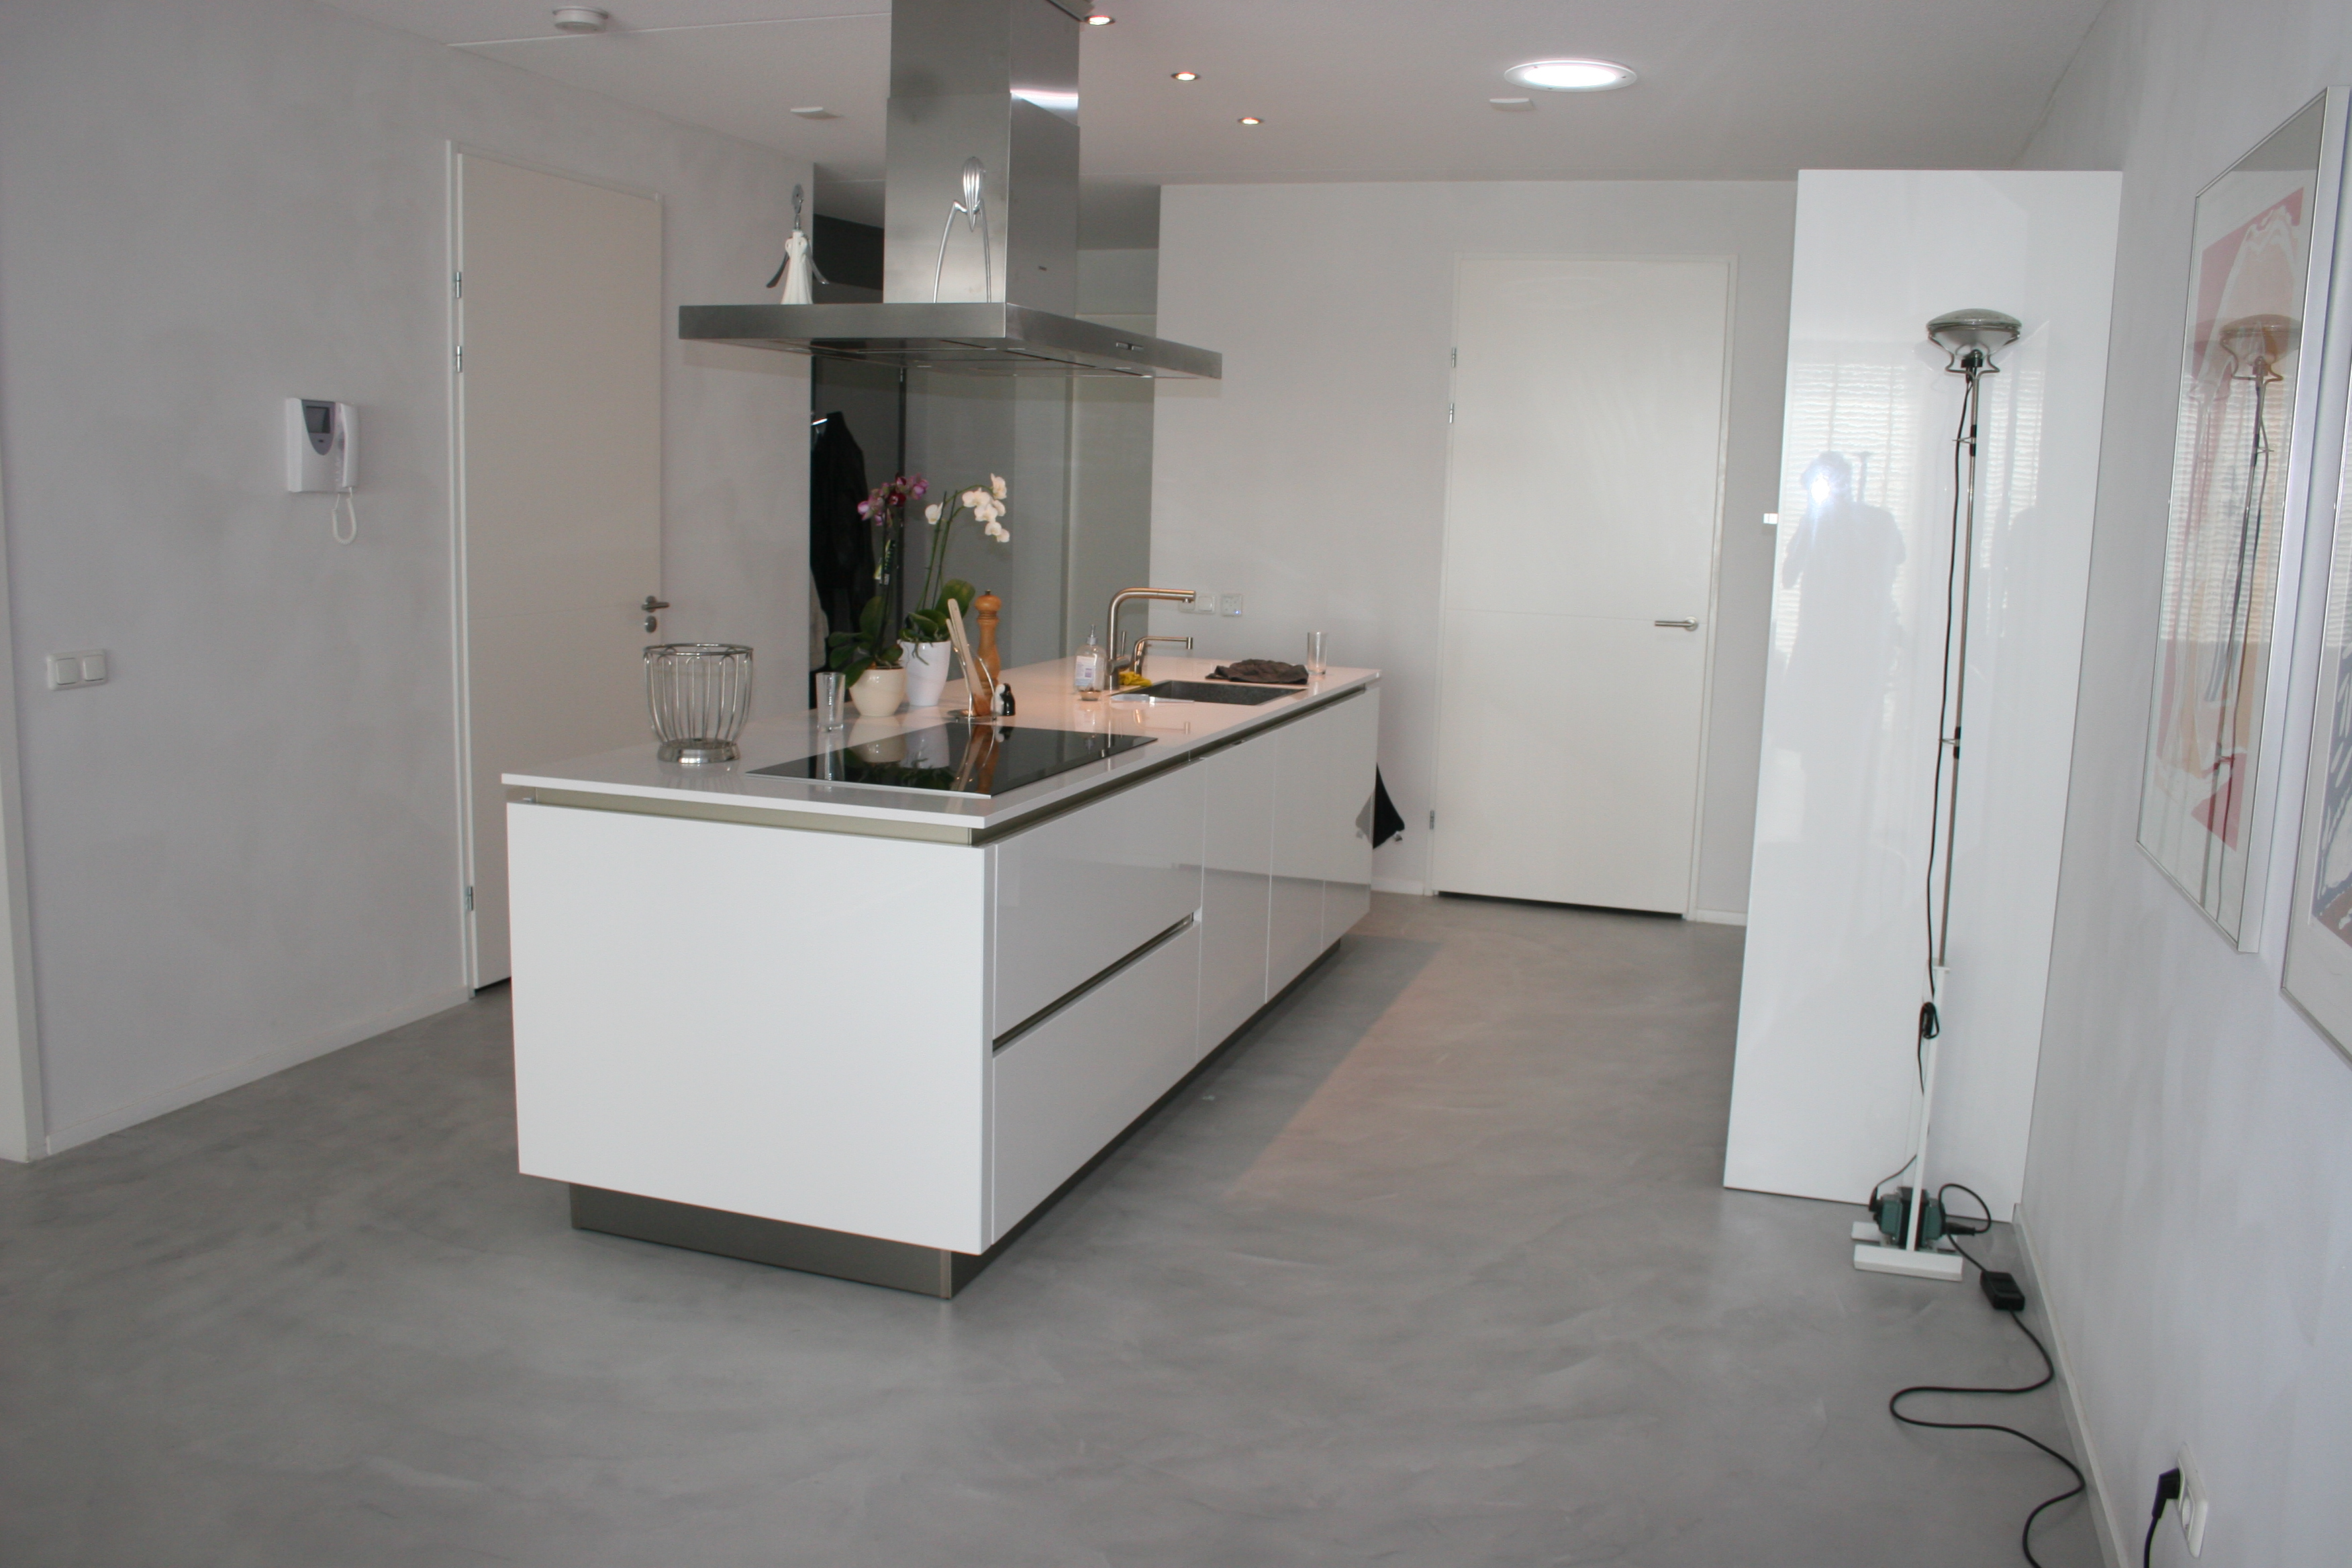 Beton Cire Keuken : File beton ciré floor g wikimedia commons